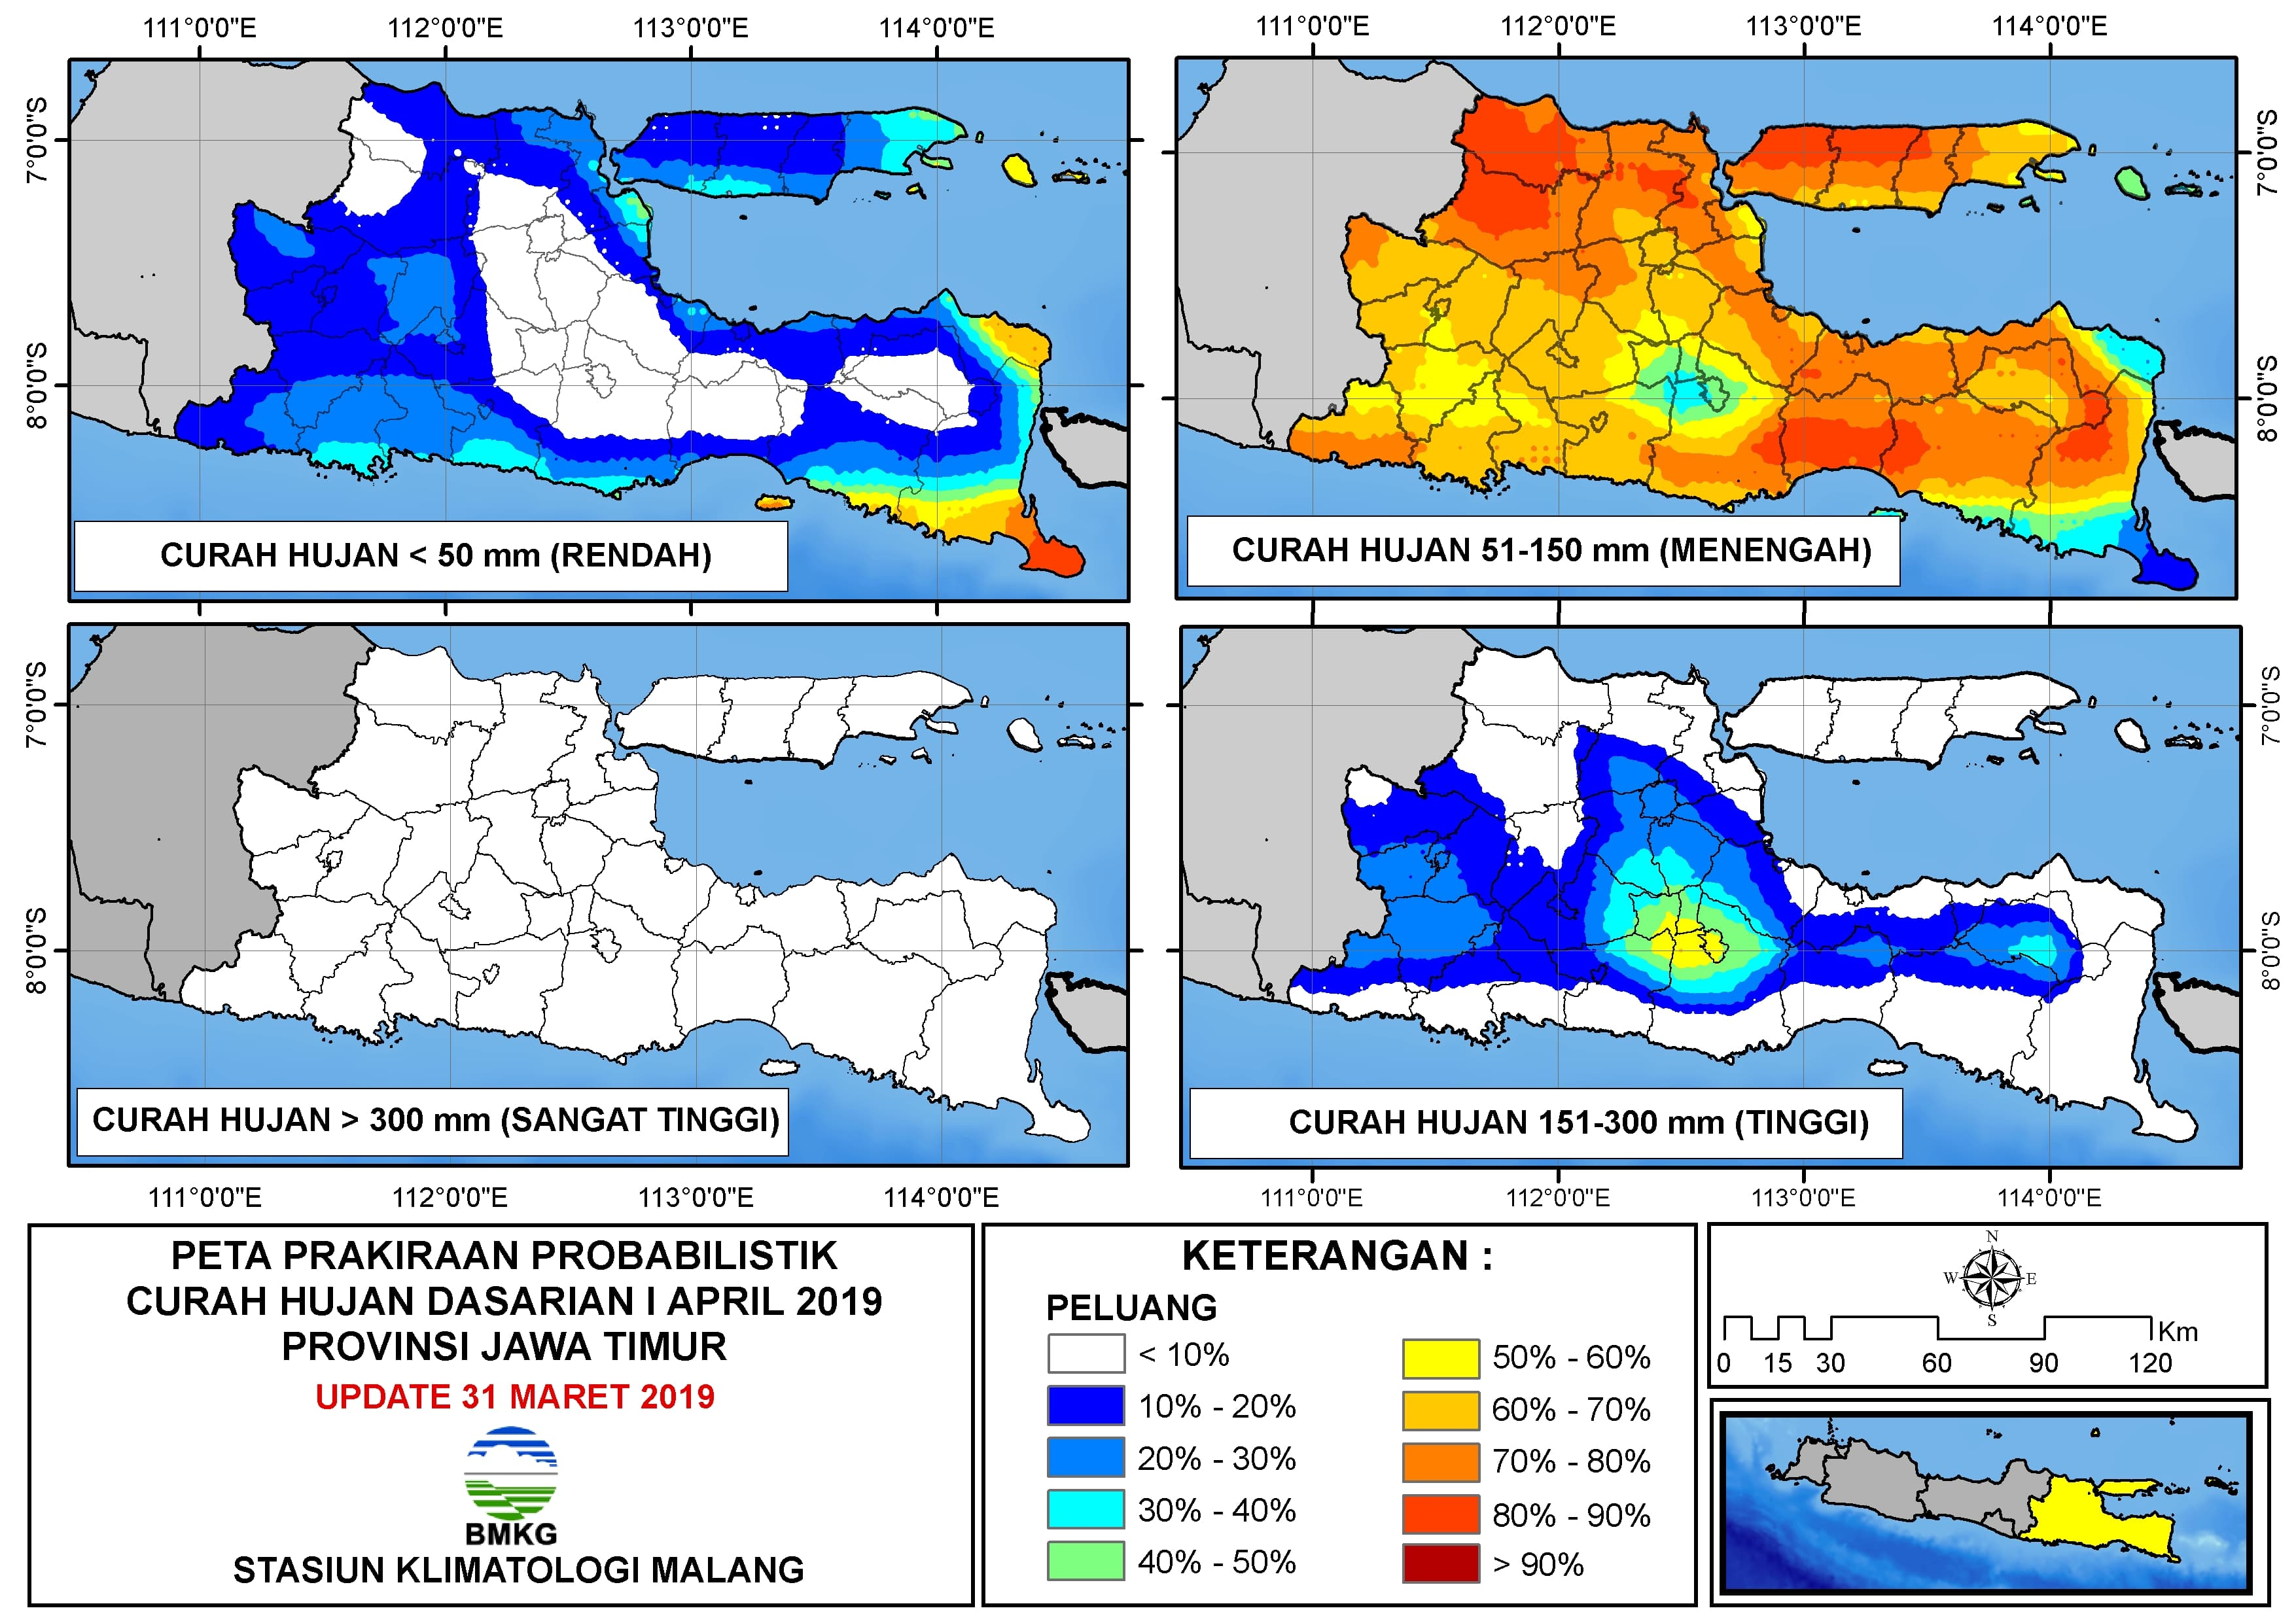 Peta Prakiraan Probabilistik Curah Hujan Dasarian I III April I Mei Tahun 2019 Provinsi Jawa Timur Update 31 Maret 2019